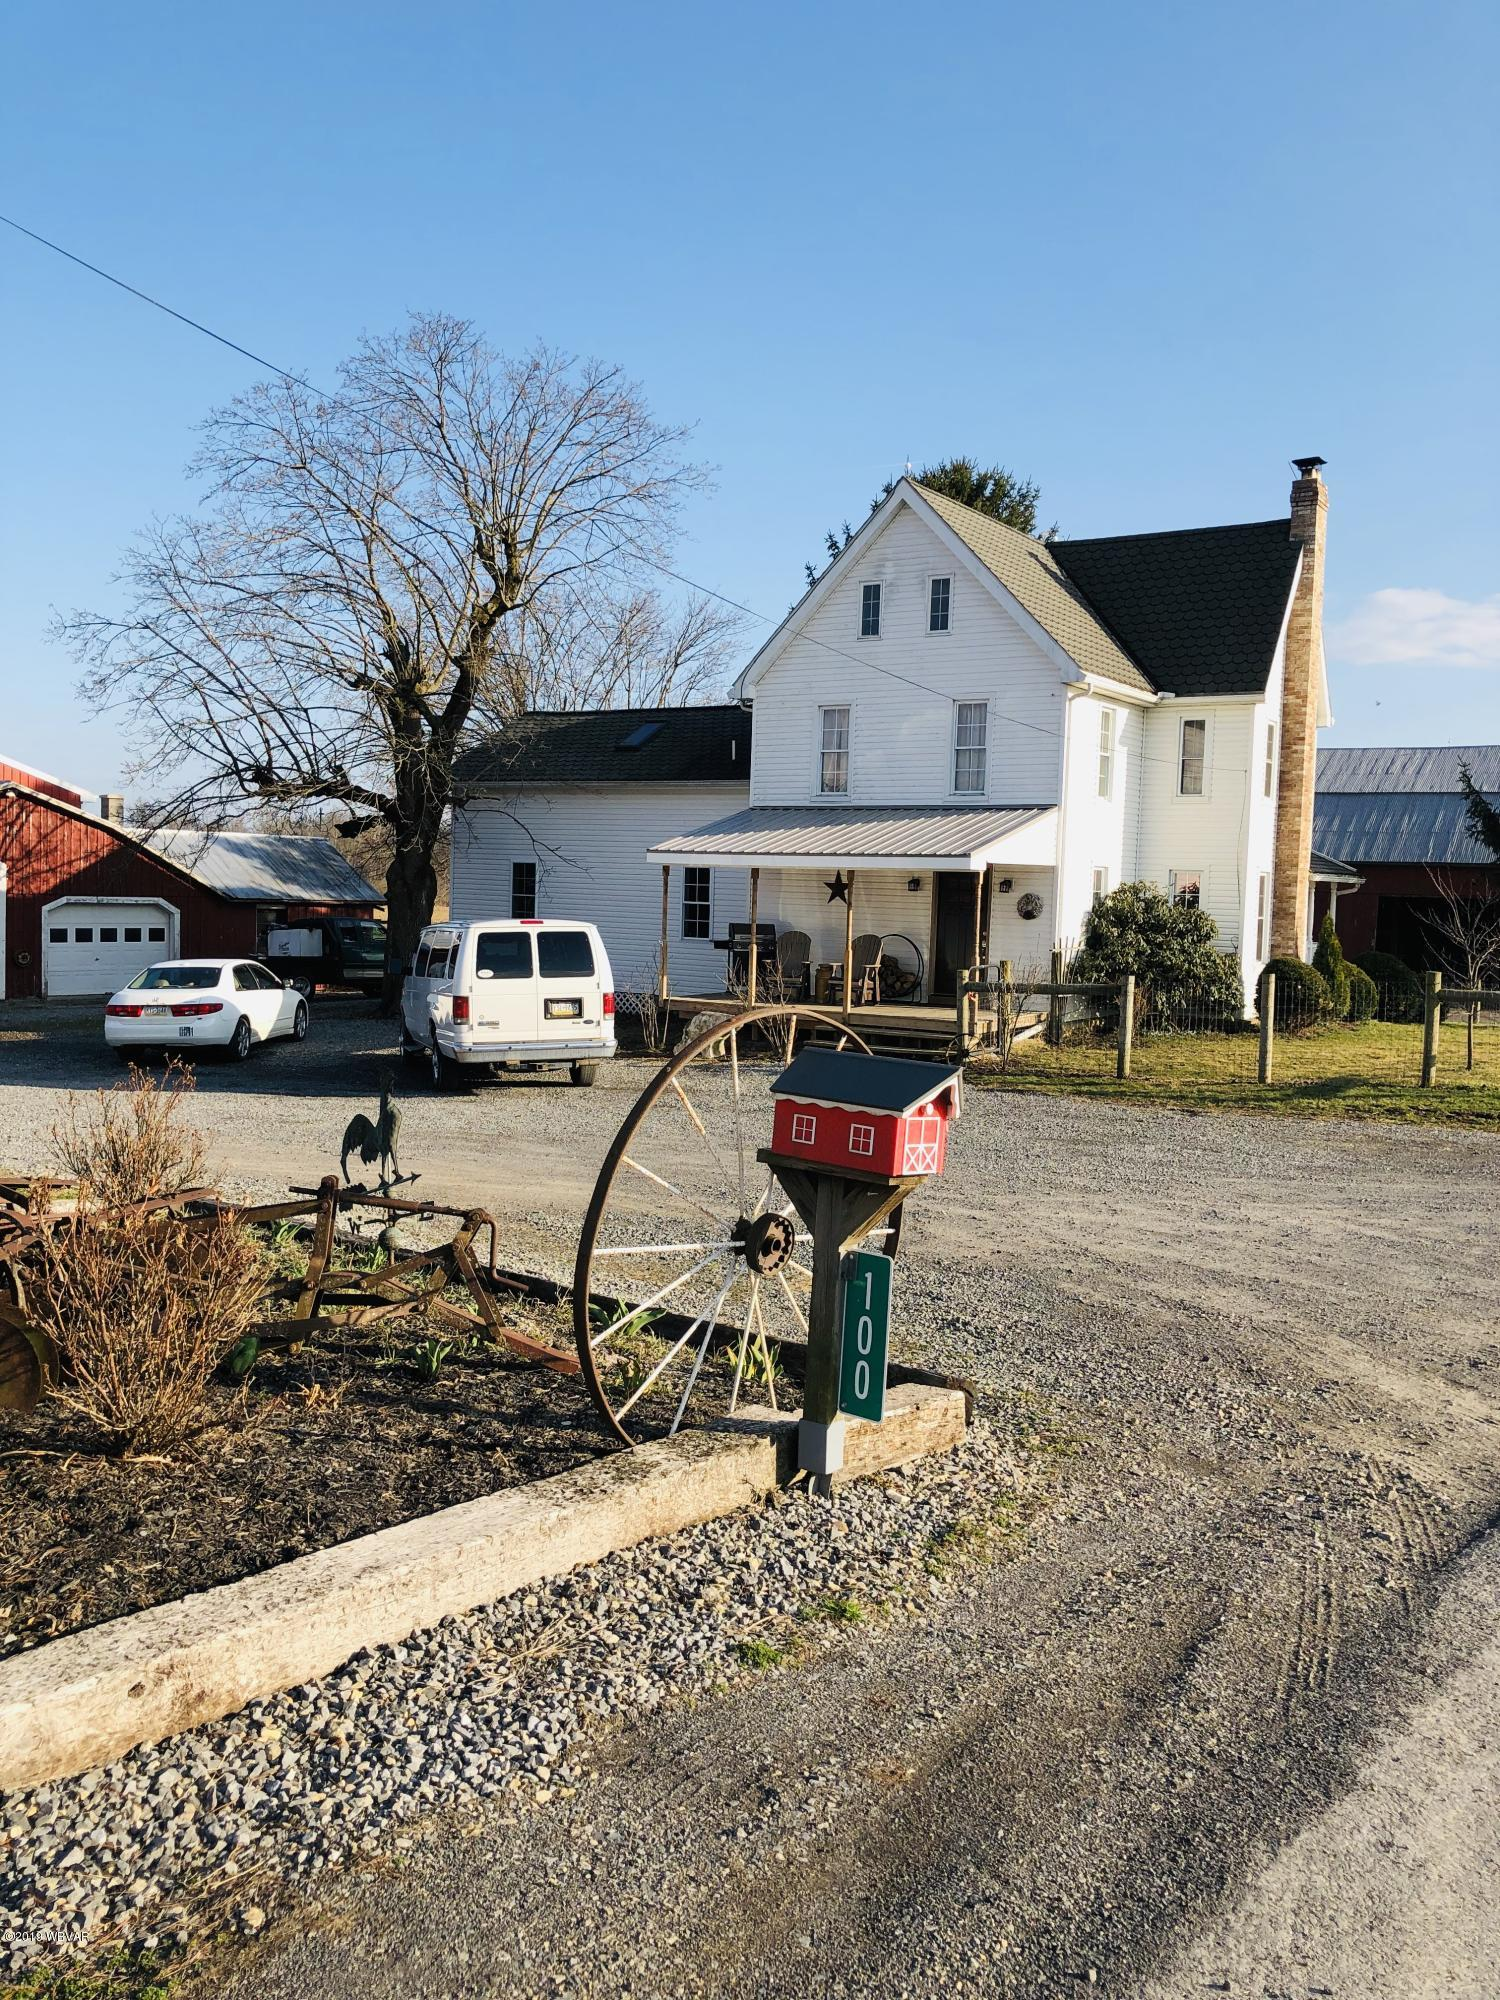 100 MILL ROAD,Turbotville,PA 17772,4 Bedrooms Bedrooms,2 BathroomsBathrooms,Farm,MILL,WB-87016